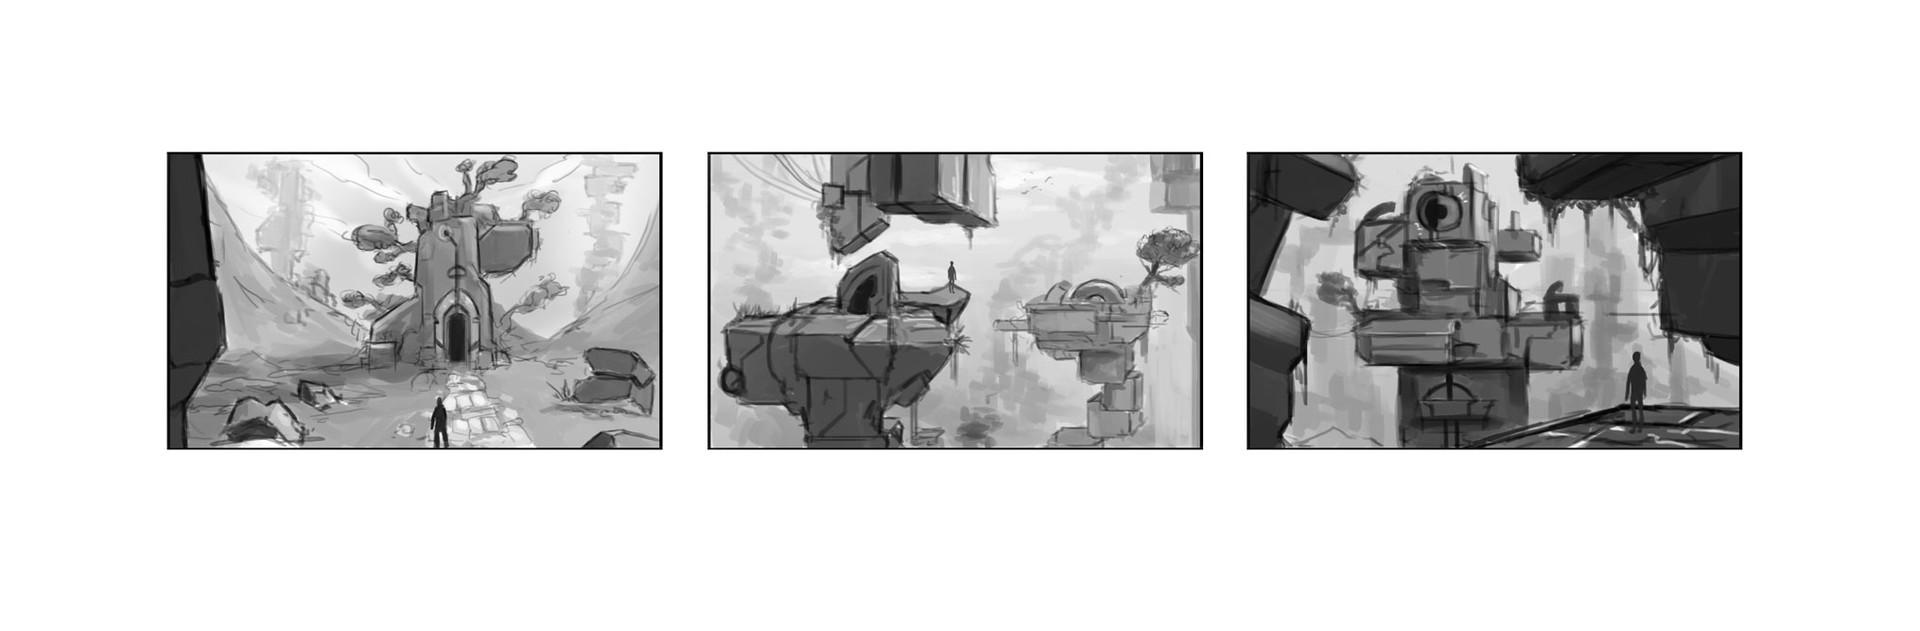 Danny kundzinsh invert art style exploration sketches